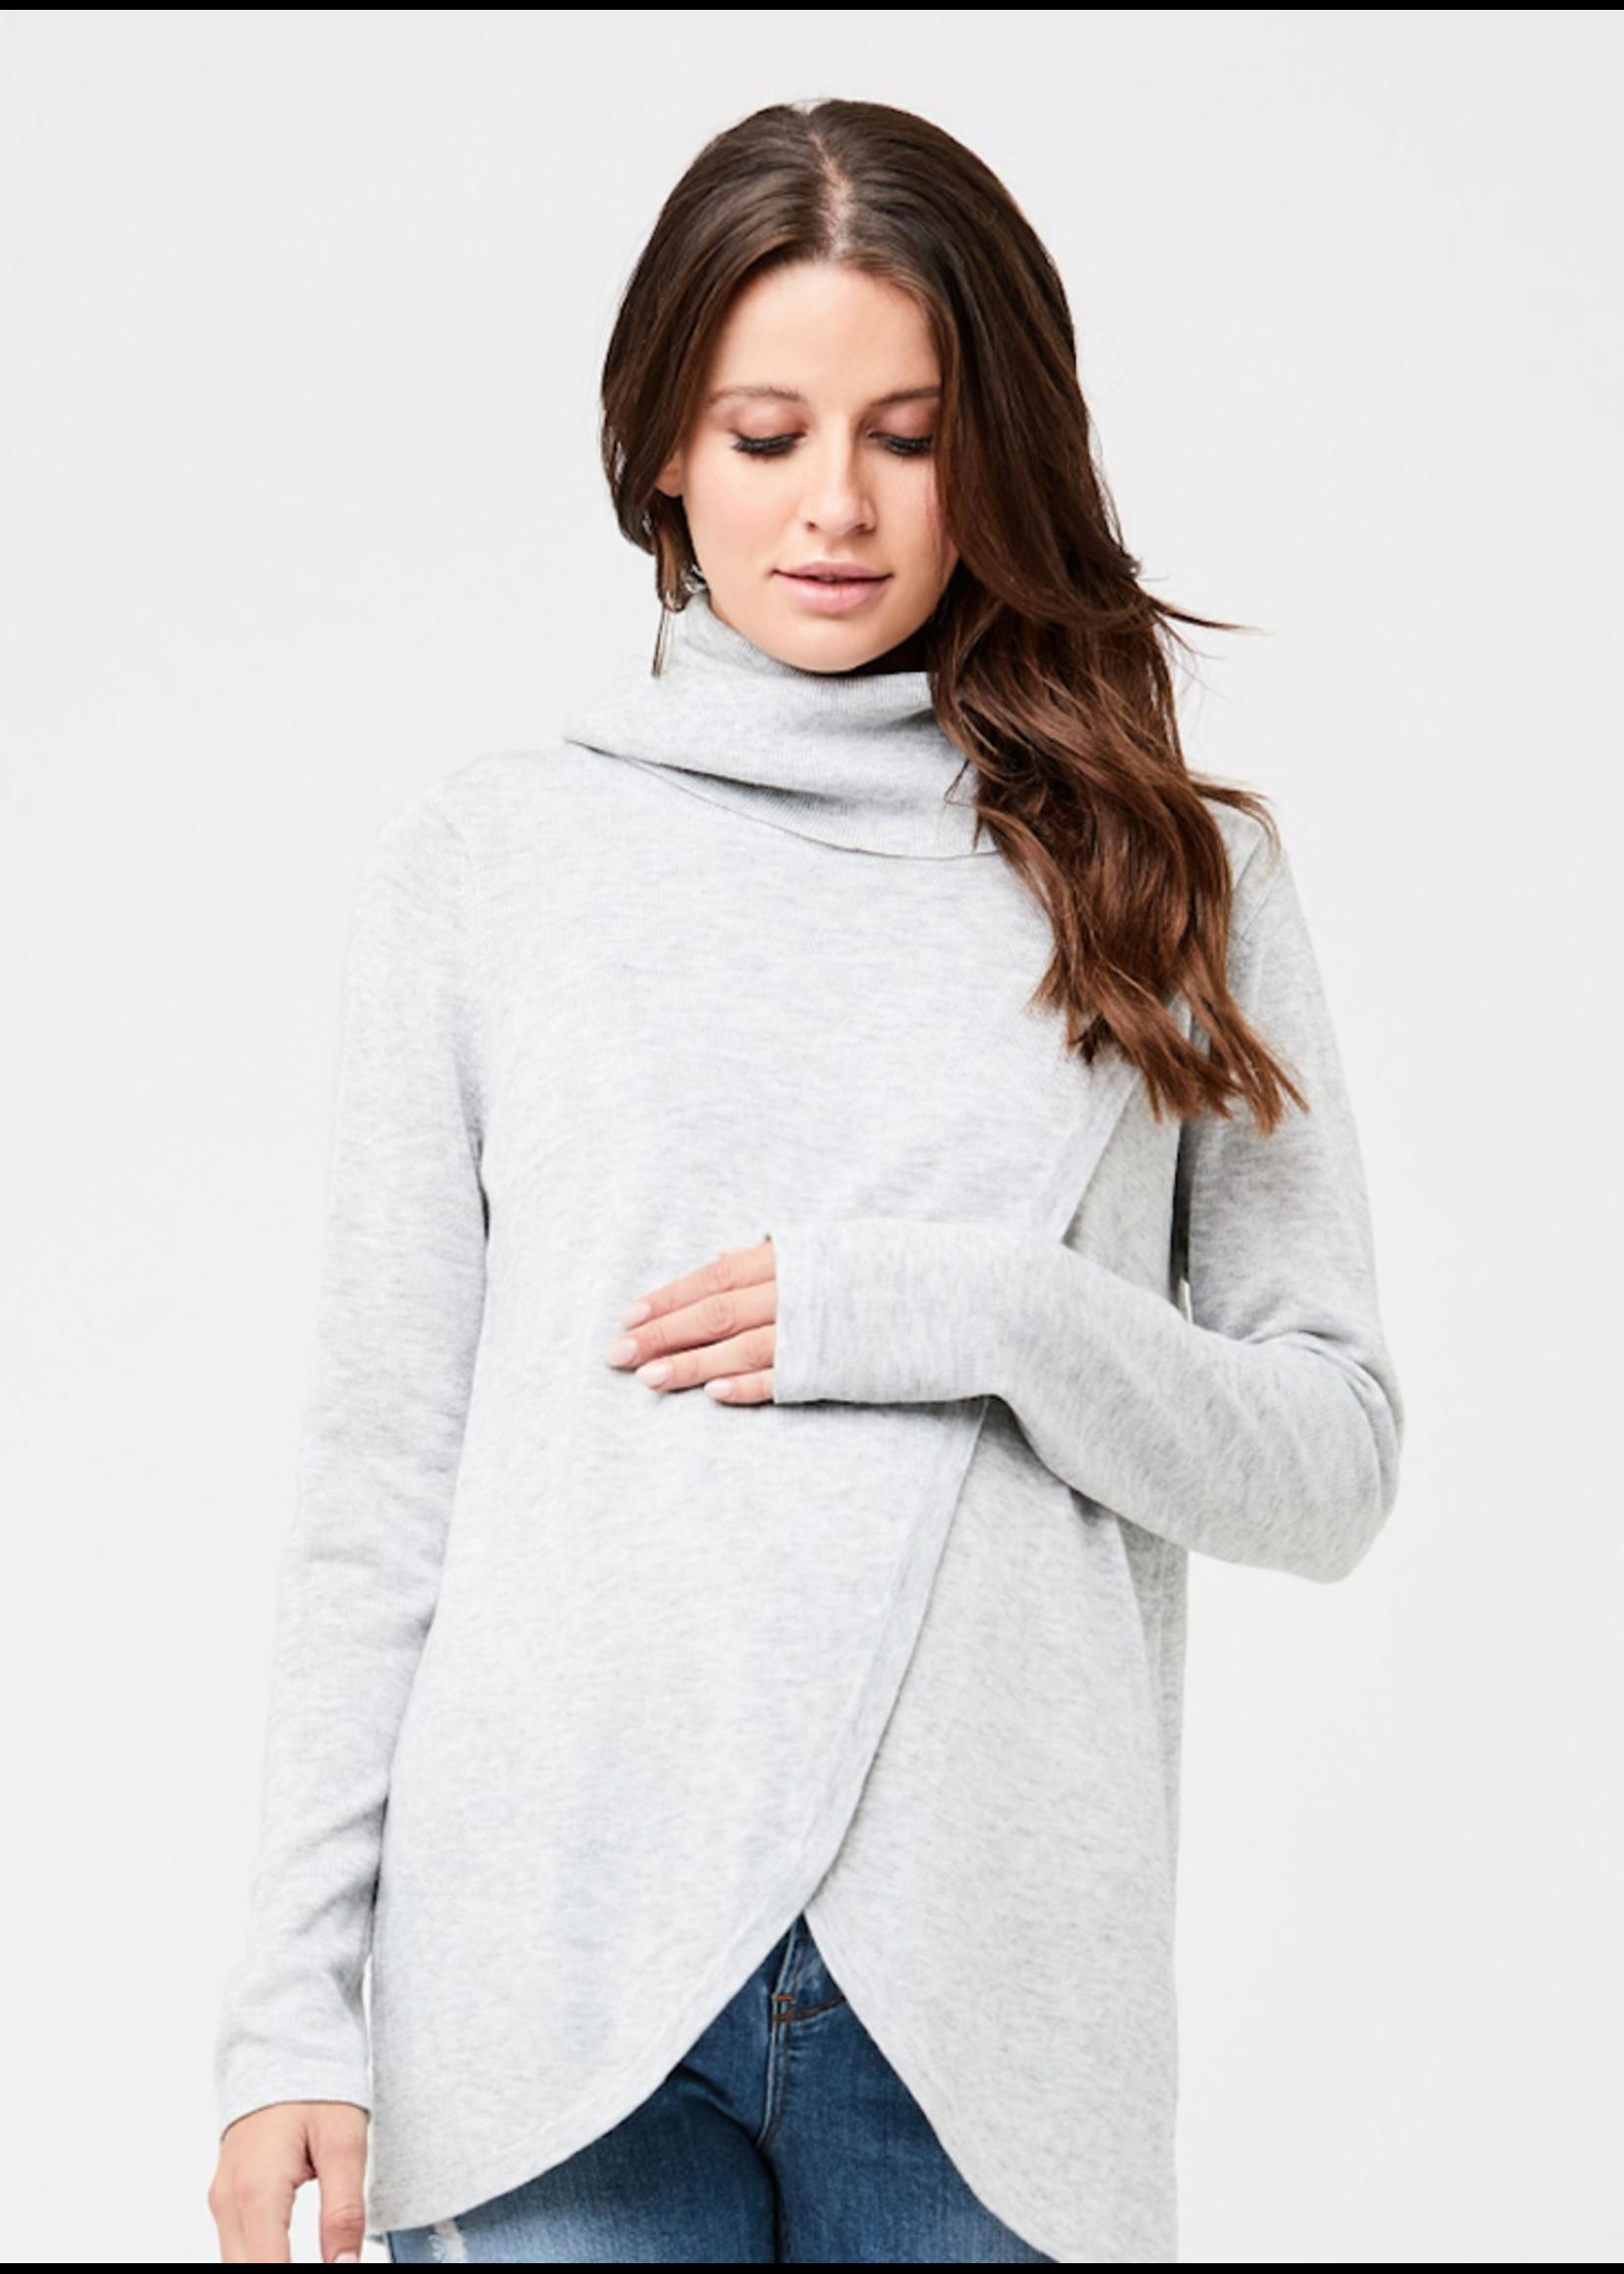 Ripe Maternity Ripe Maternity, Cowl Neck Nursing Knit Sweater in Silver Marle